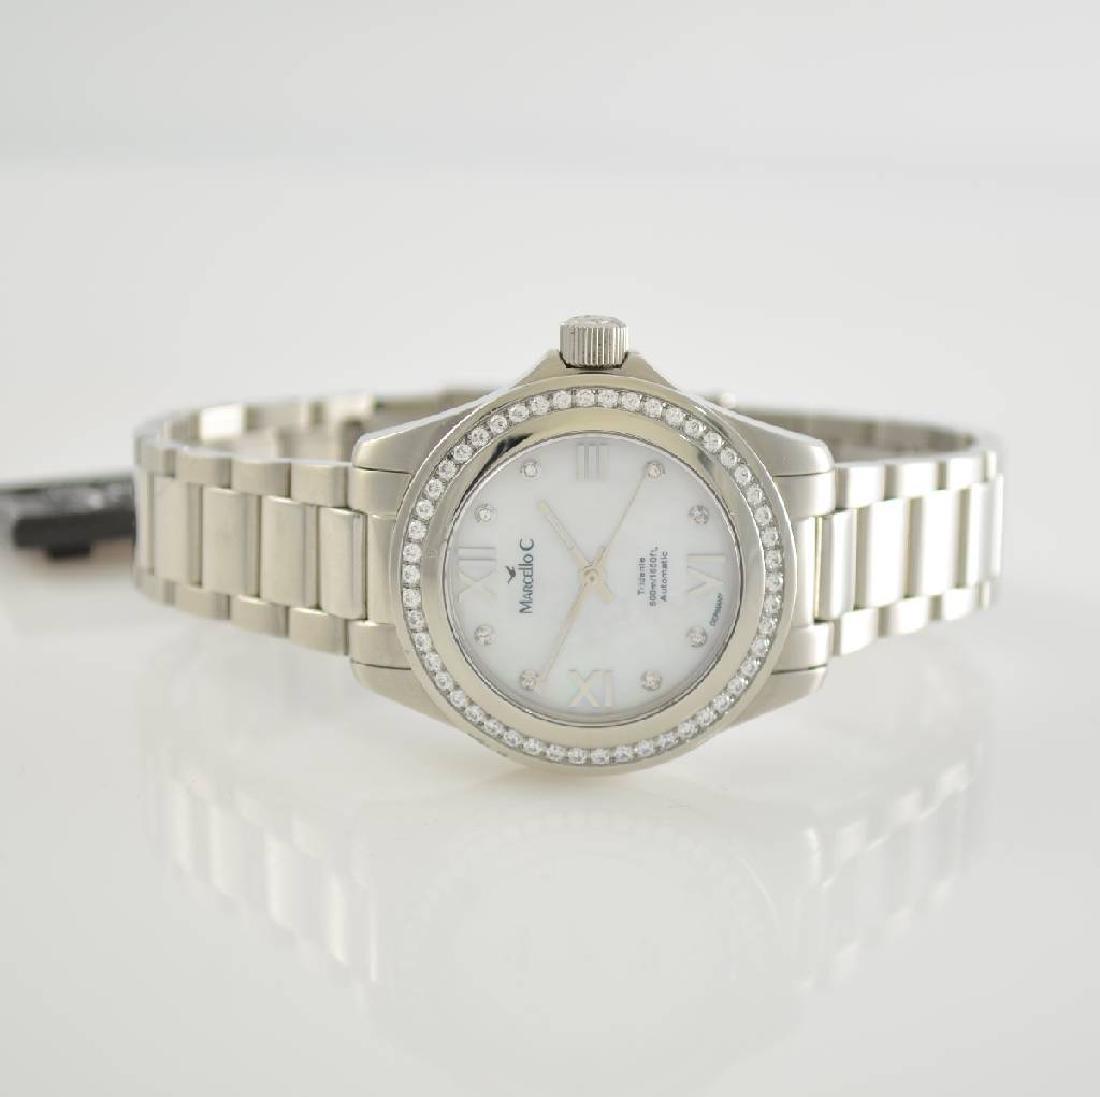 MARCELLO C ladies wristwatch series Tridente